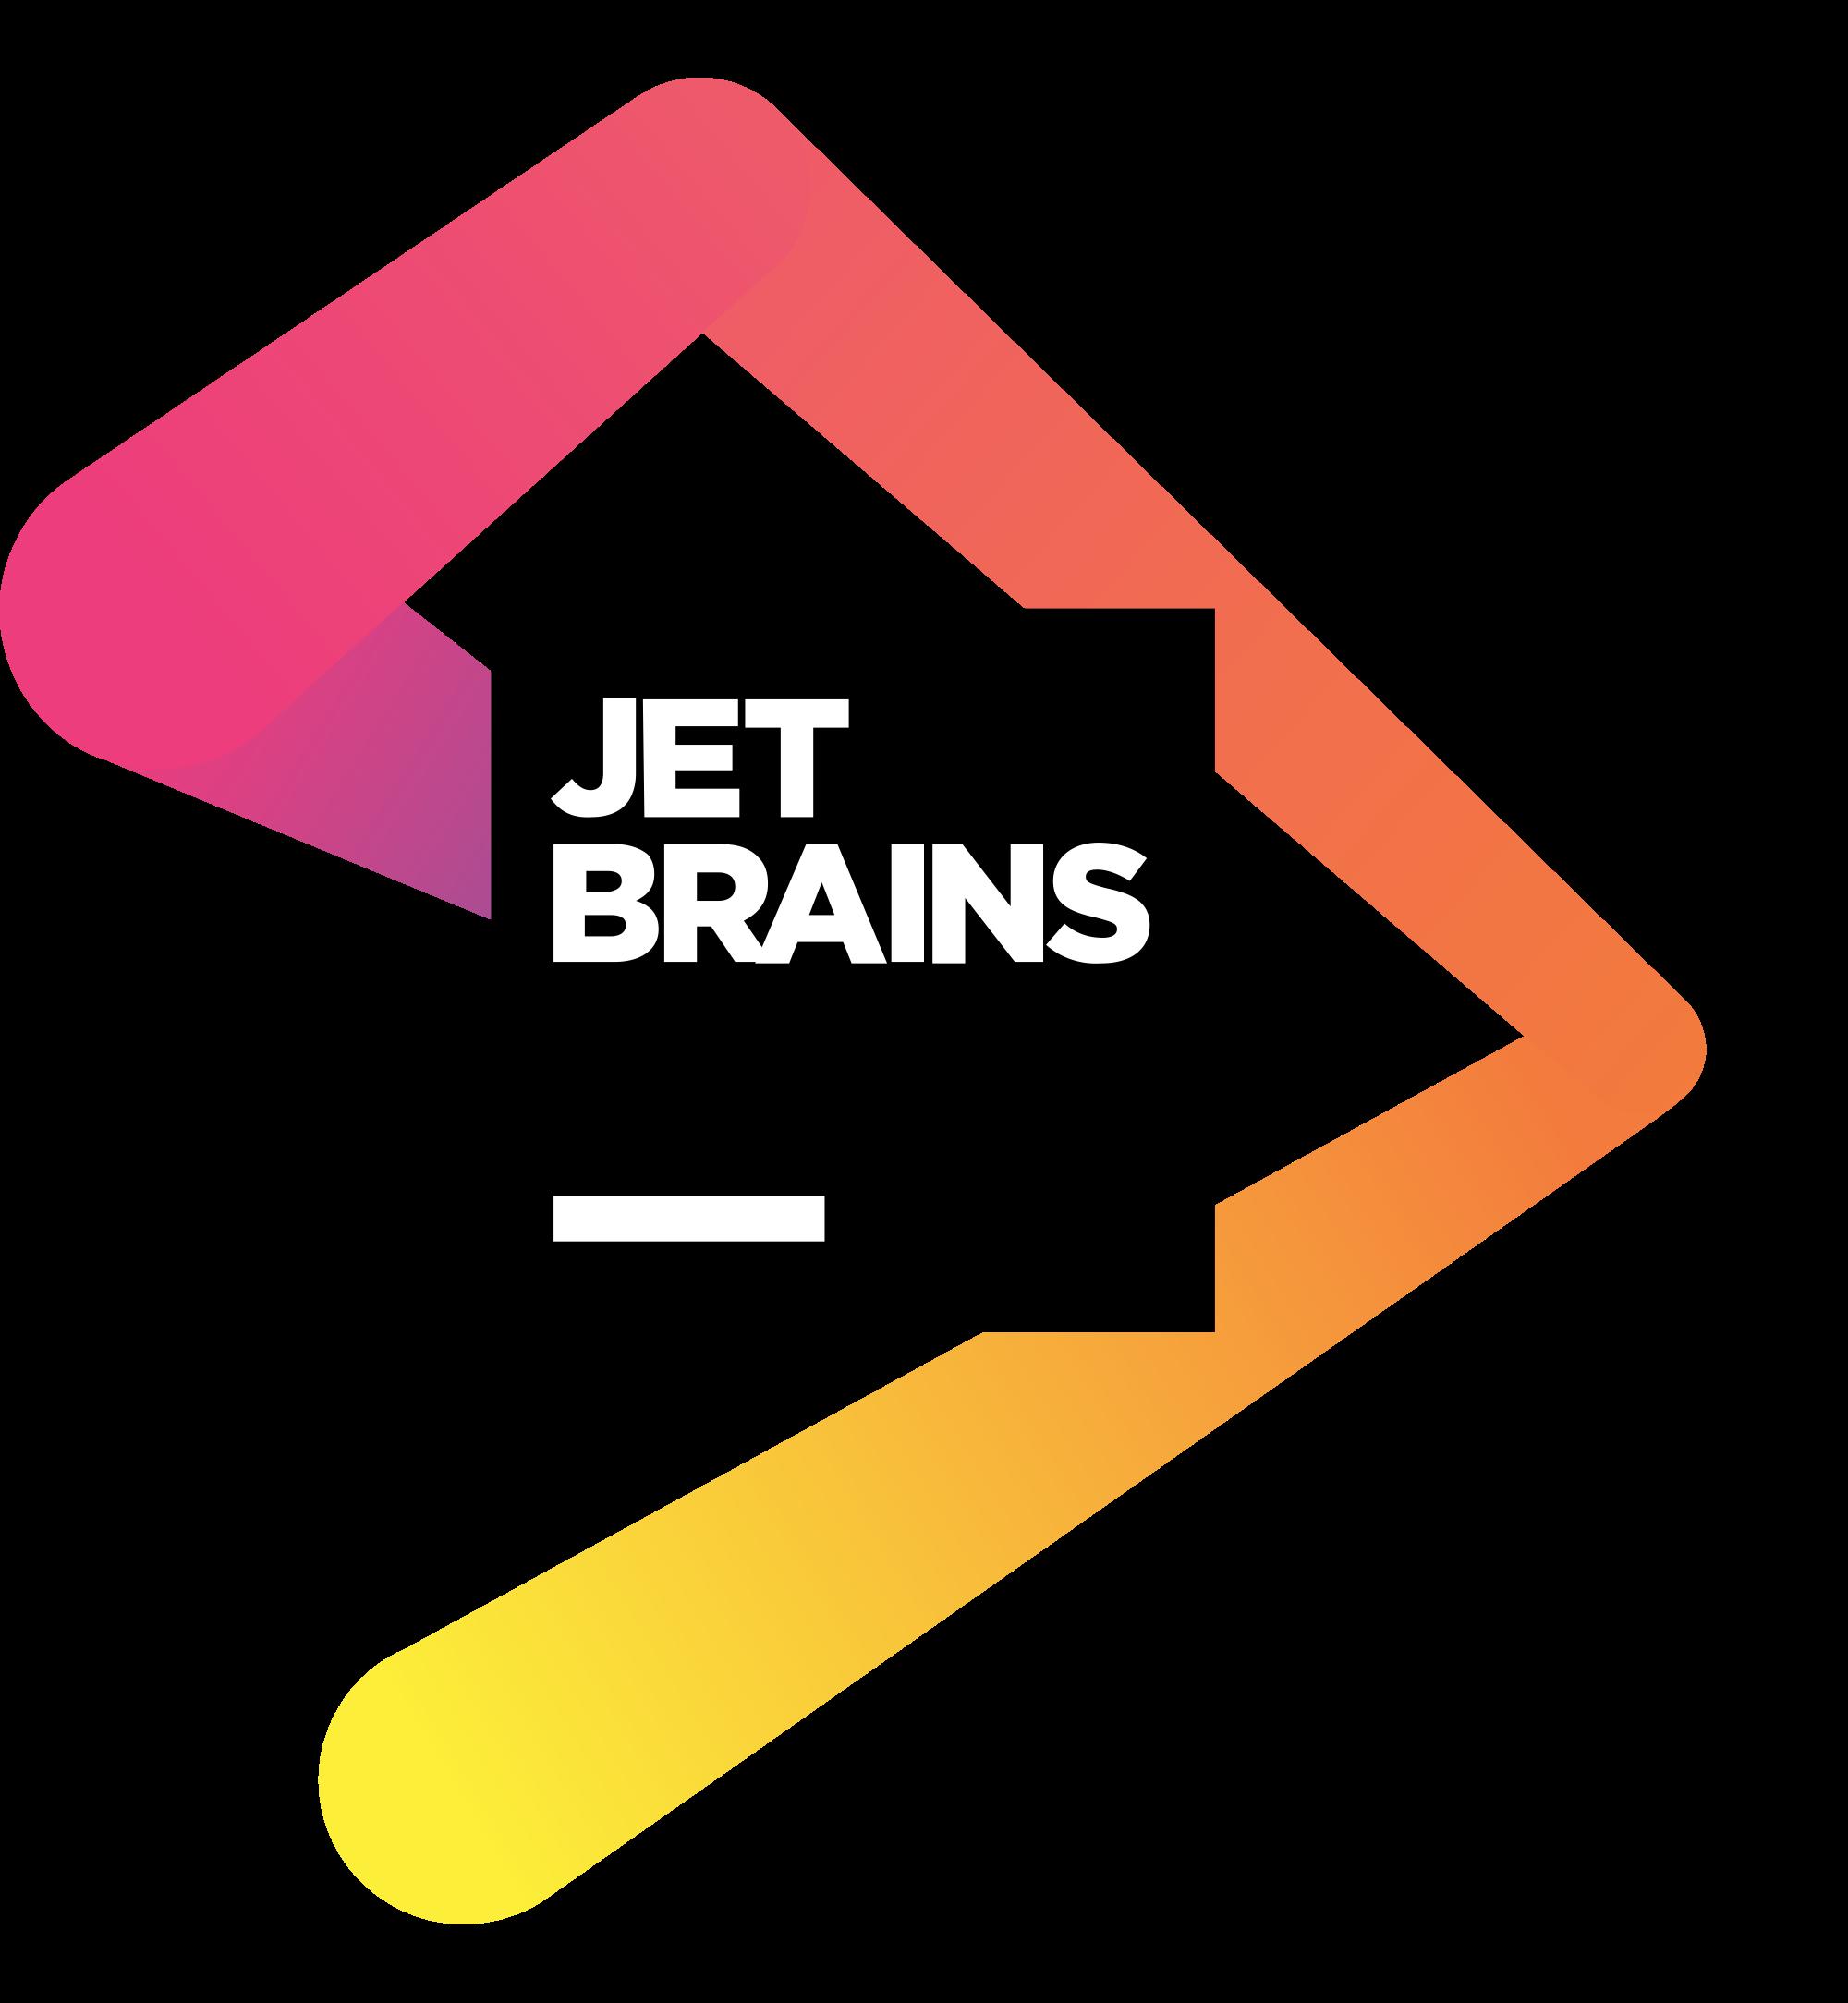 jetbrains-logo.png